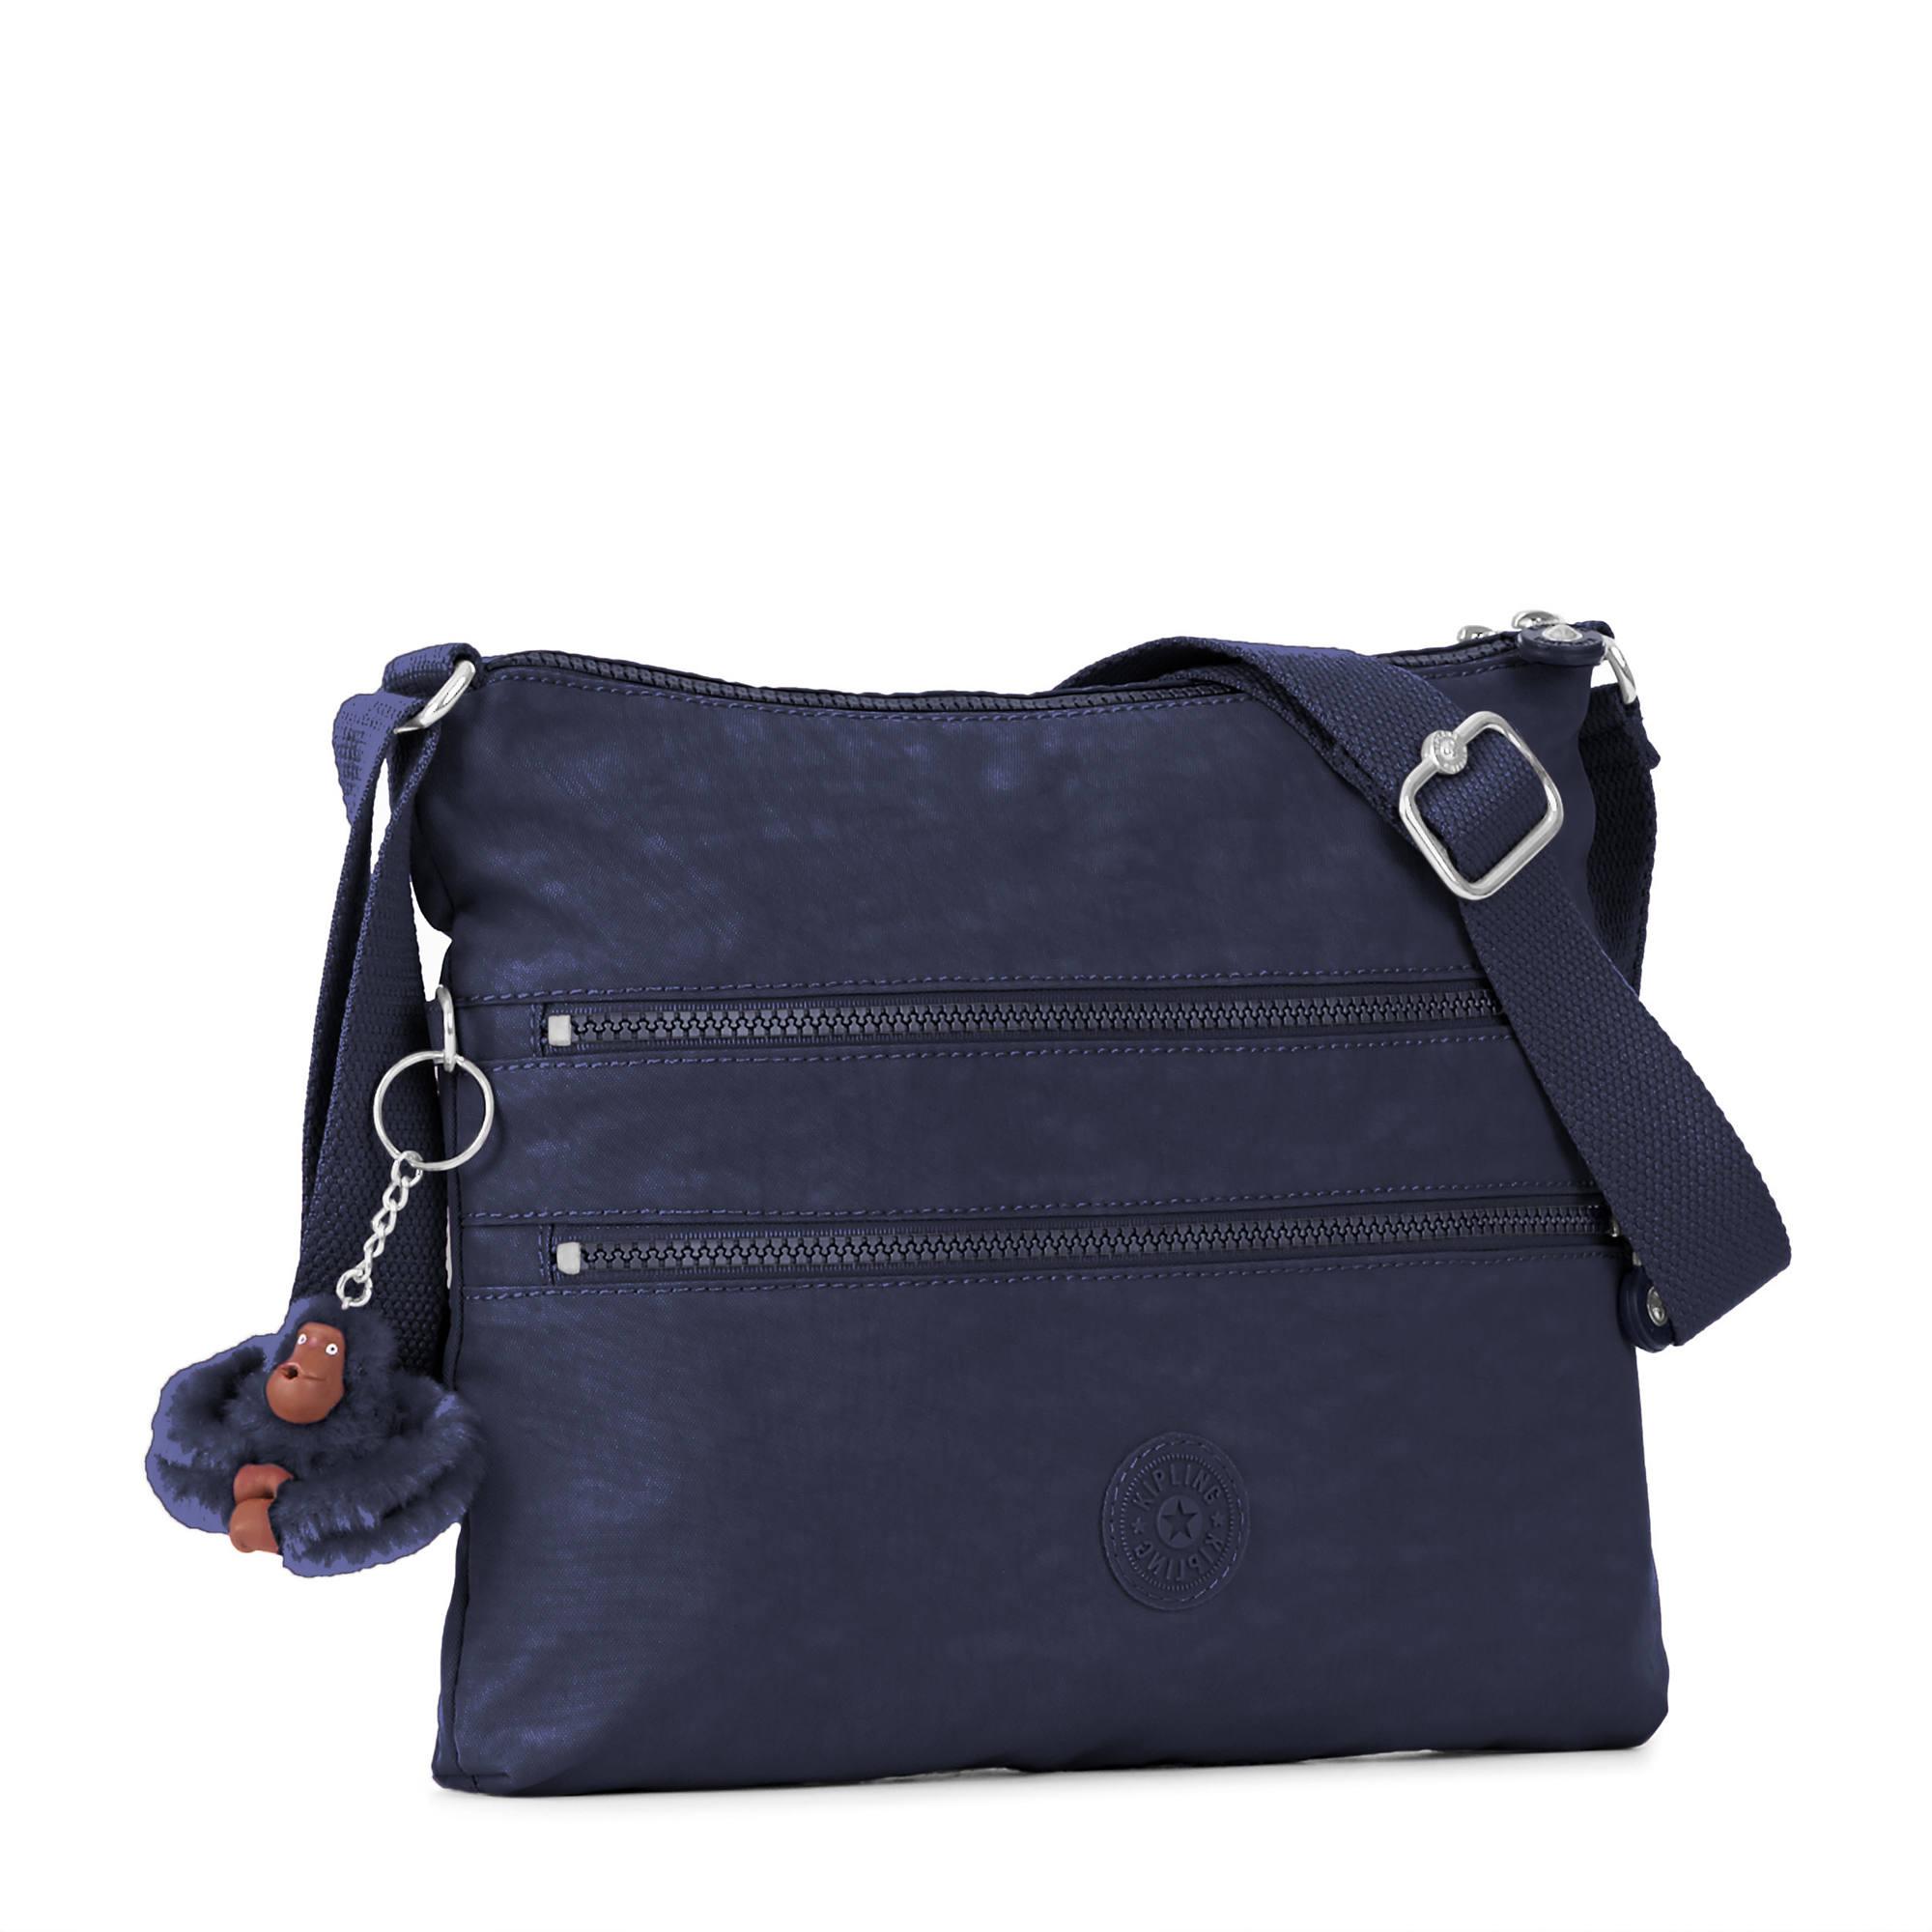 Kipling-Alvar-Metallic-Crossbody-Bag miniature 49